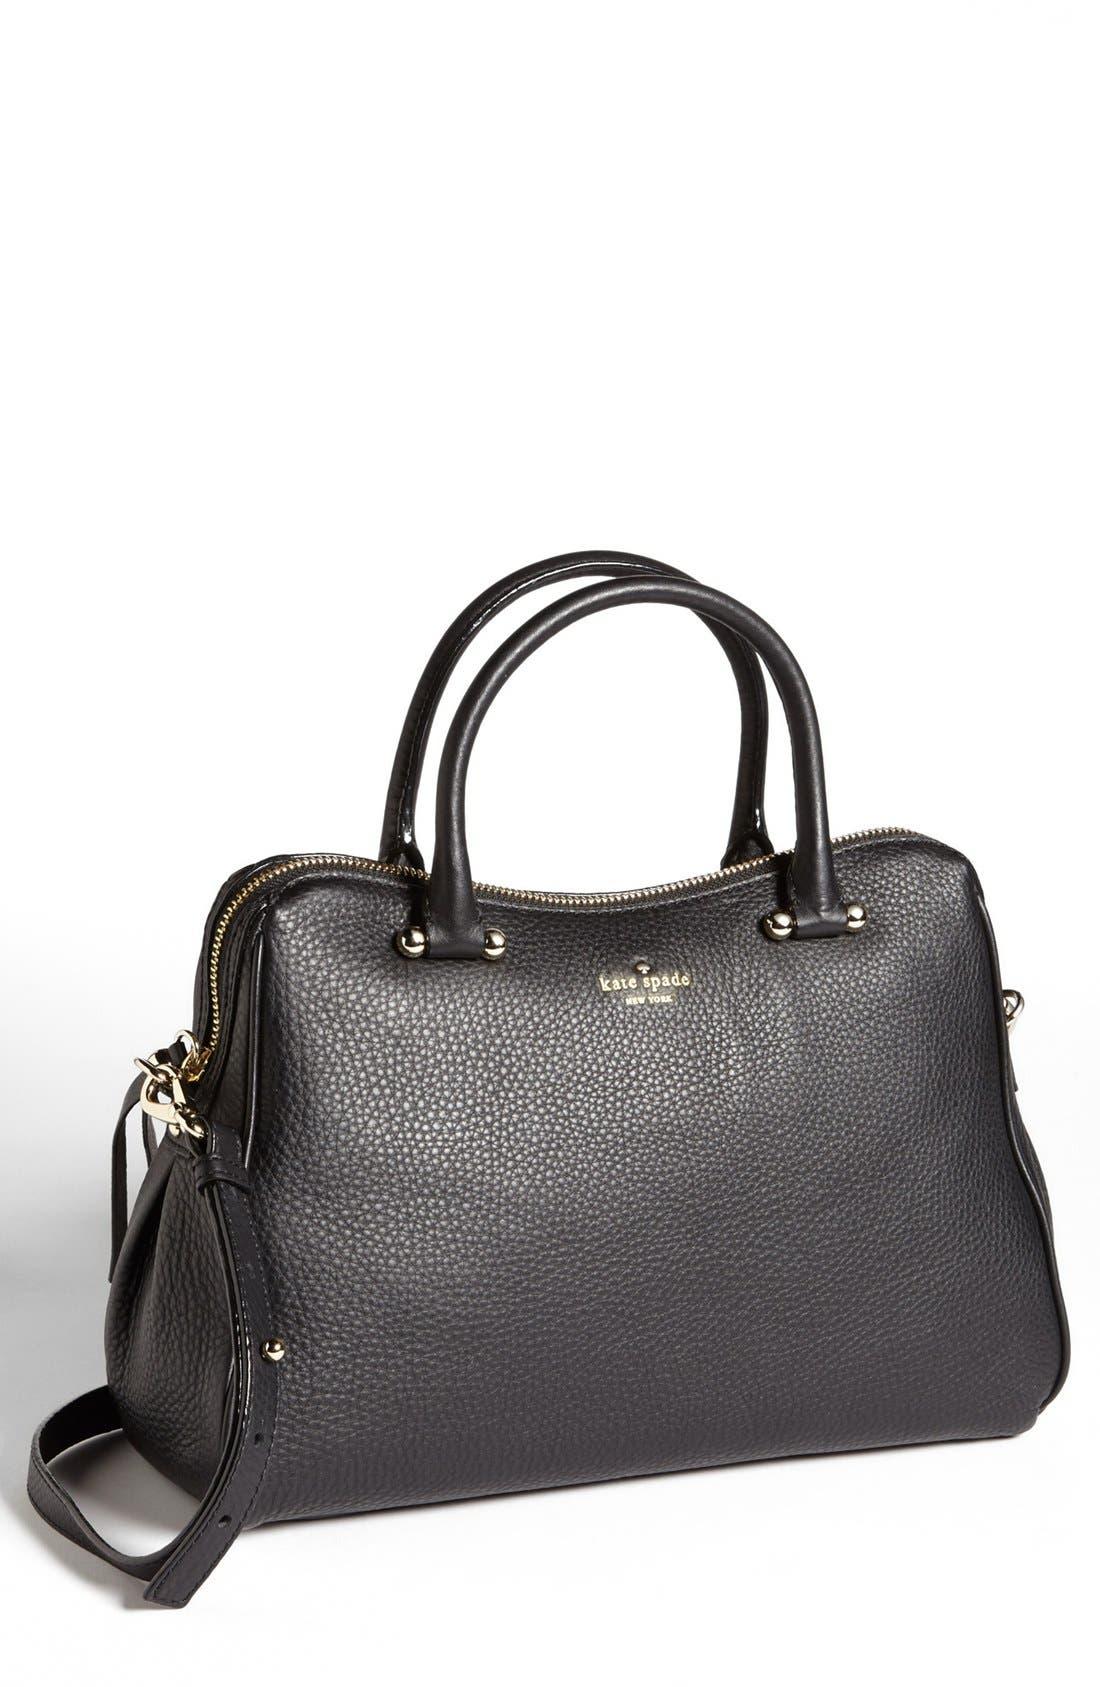 Alternate Image 1 Selected - kate spade new york 'charles street - audrey' leather satchel